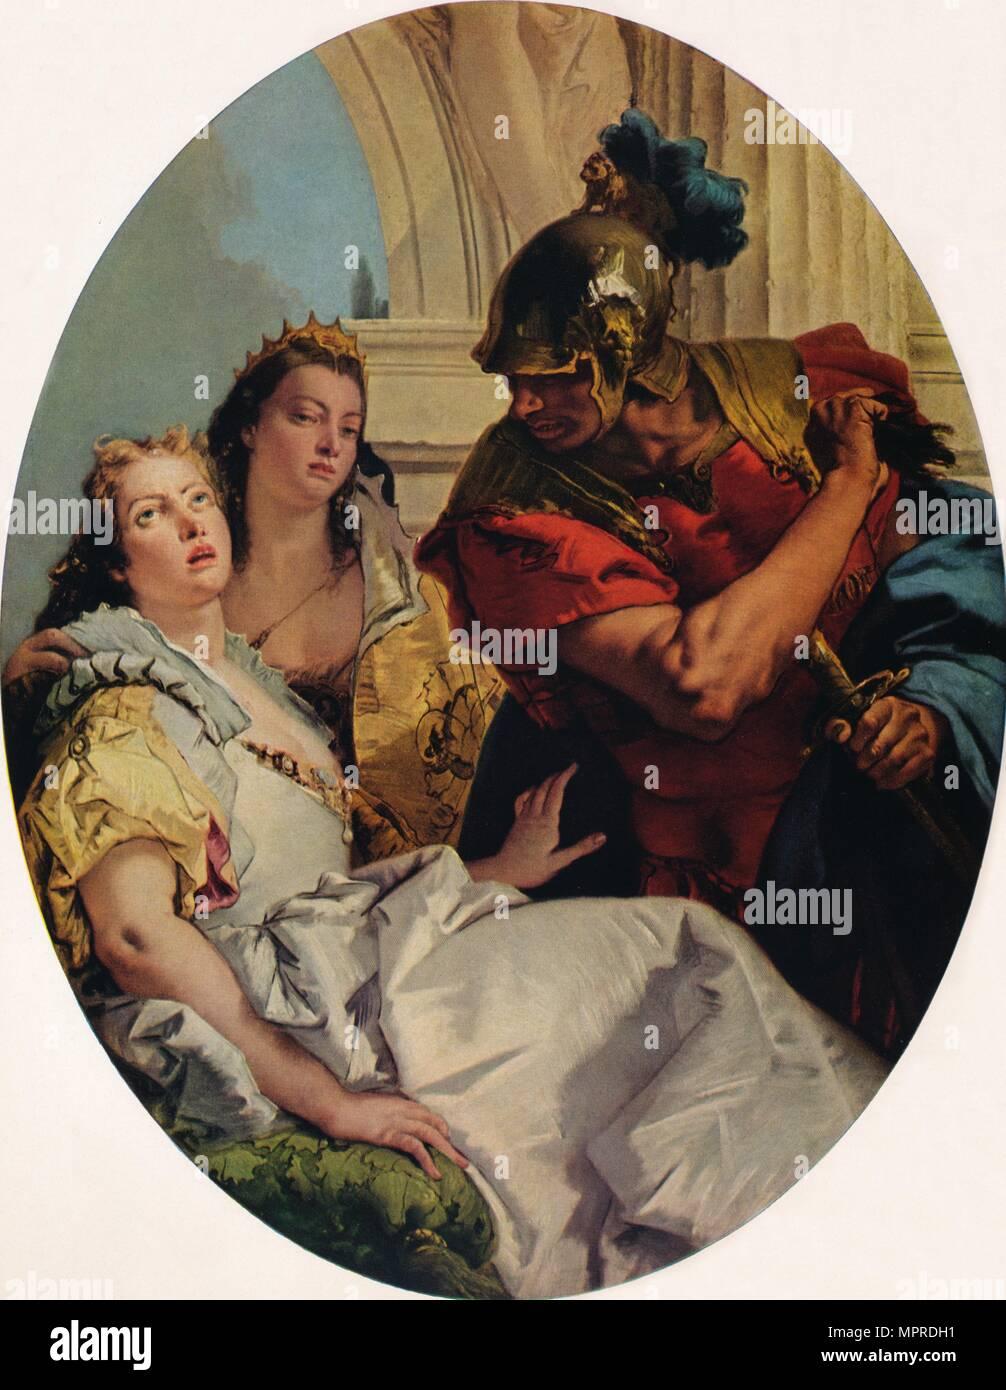 'Scene from Ancient History', c1750. Artist: Giovanni Battista Tiepolo. - Stock Image